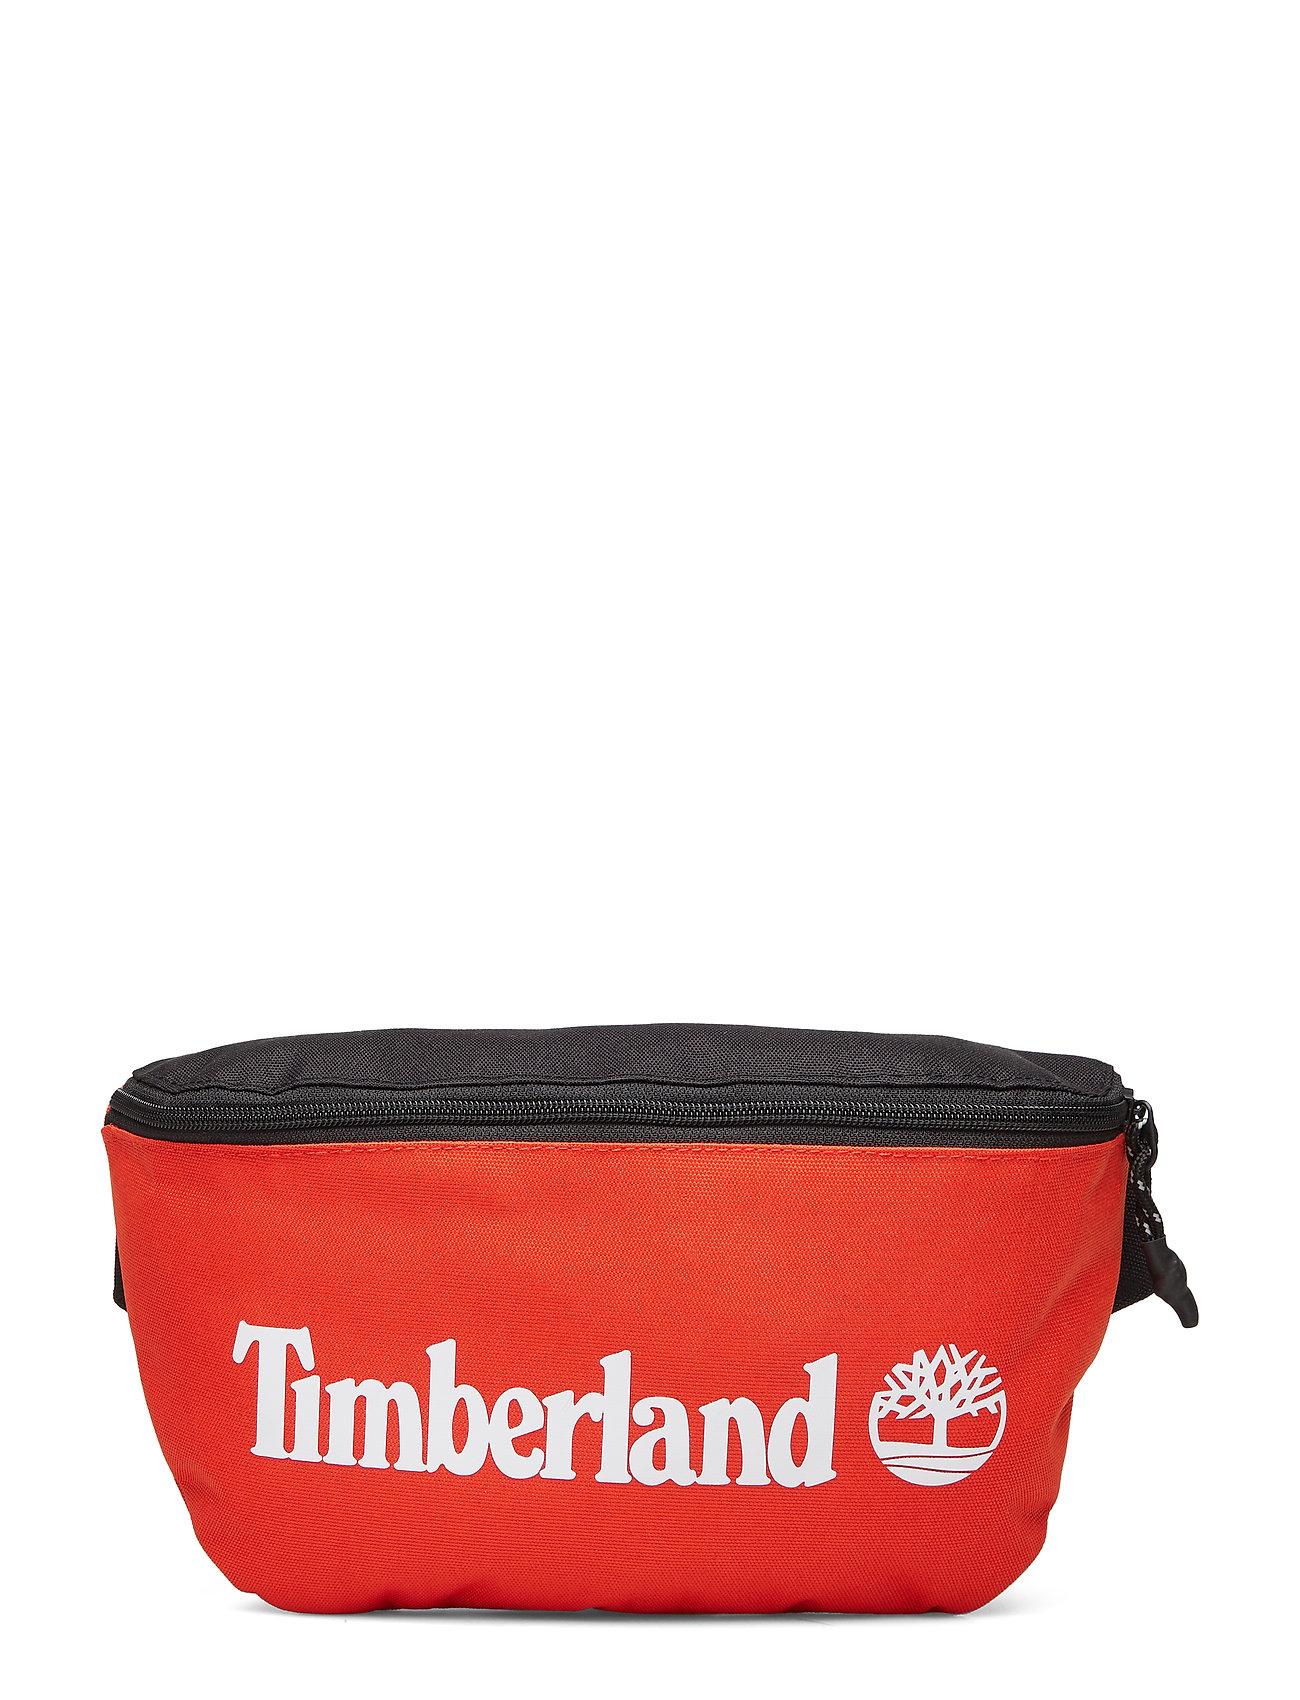 Timberland Sling Bag - SPICY ORANGE